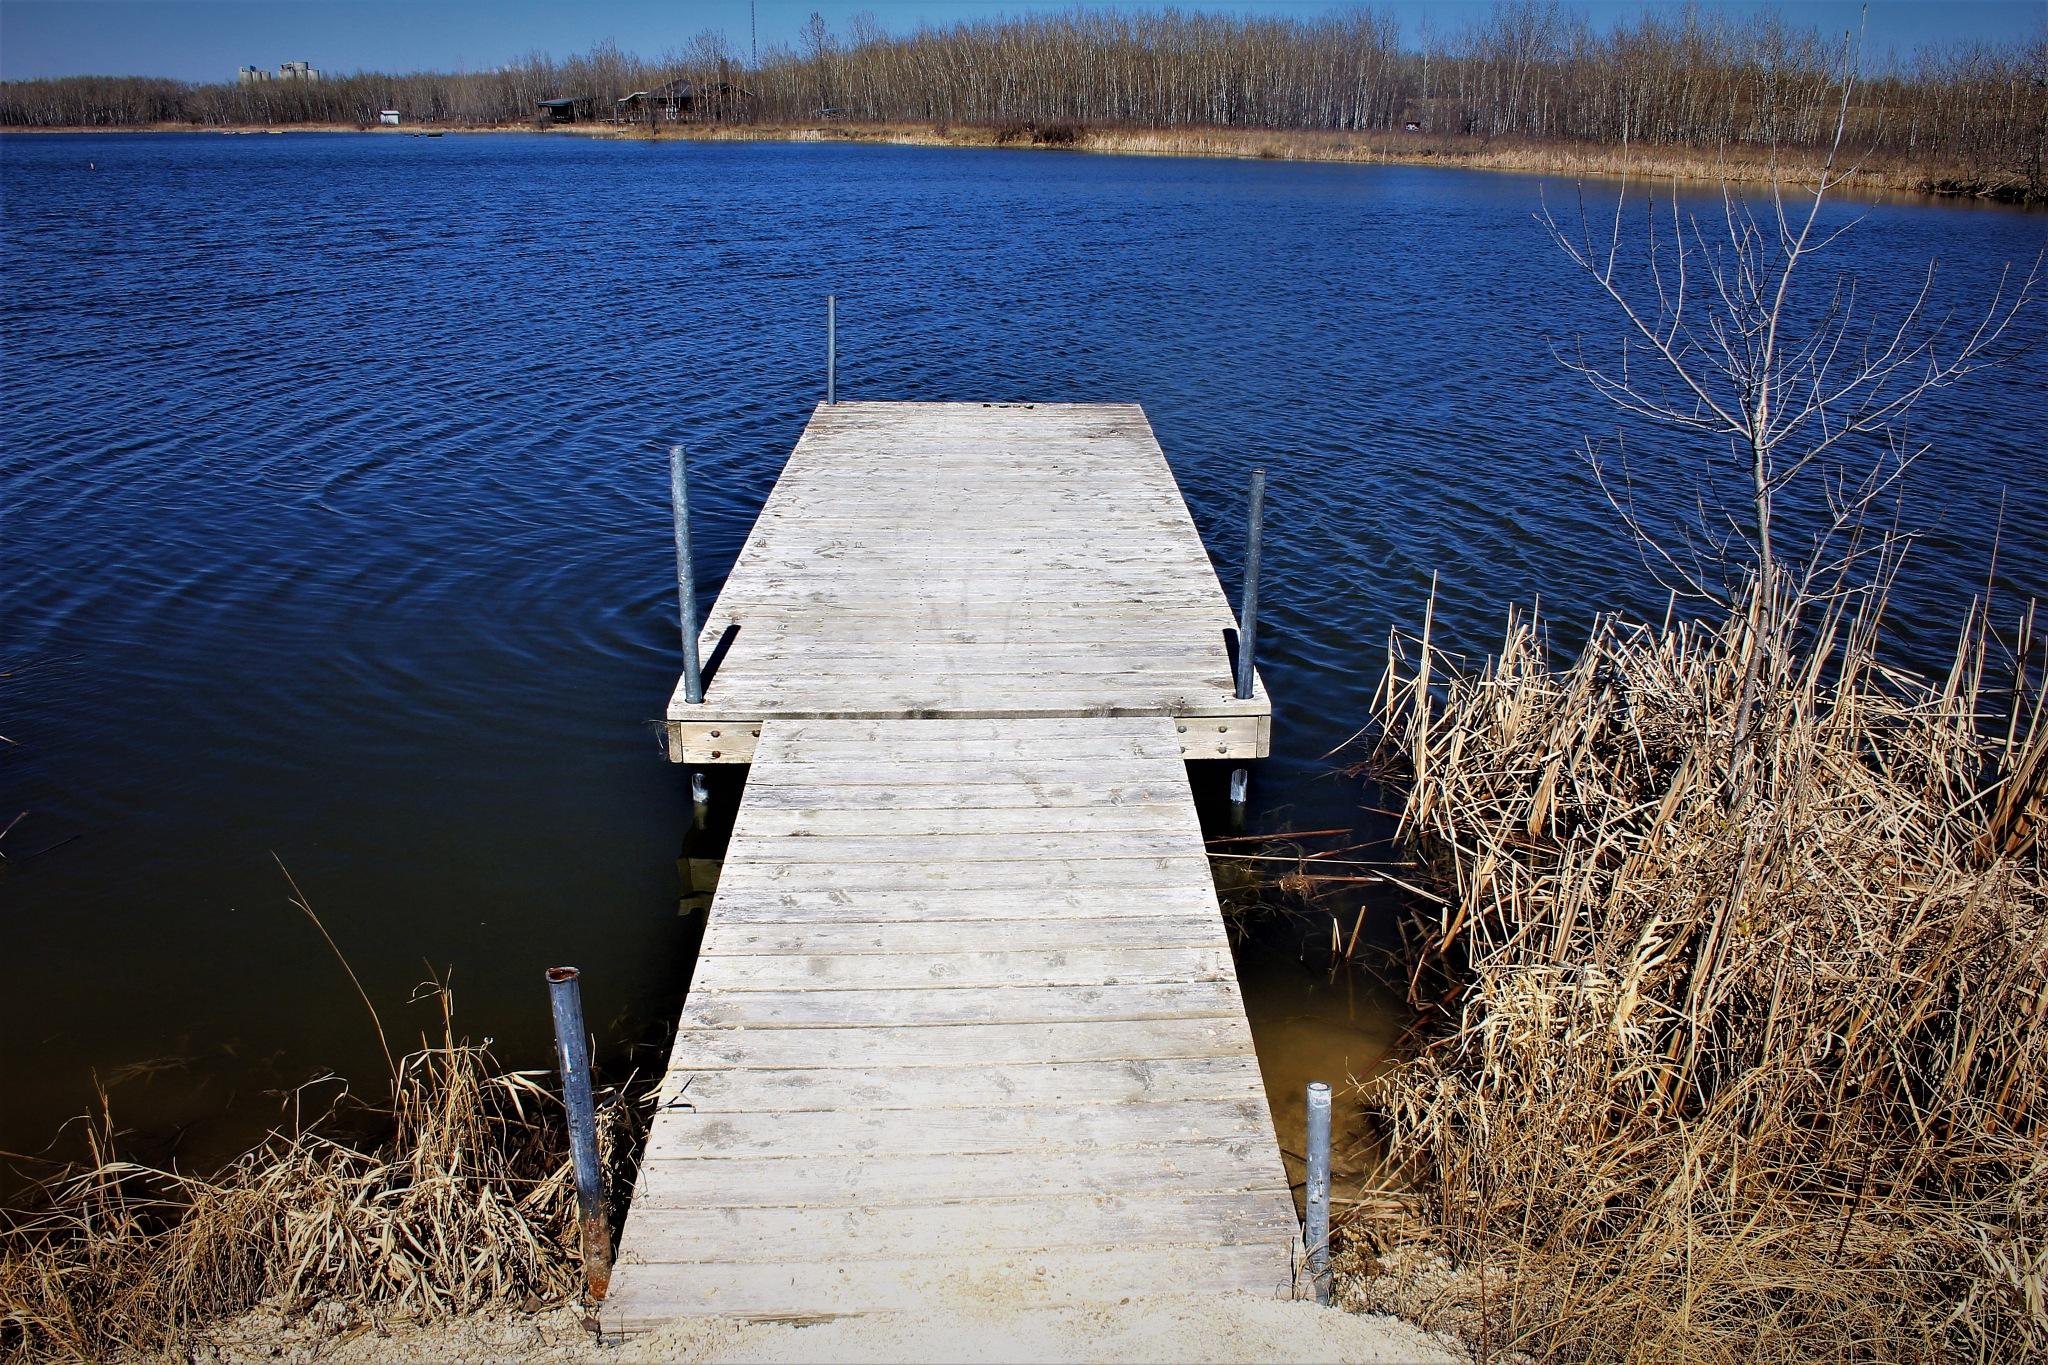 Dock Awaiting Summer  by David Imrie